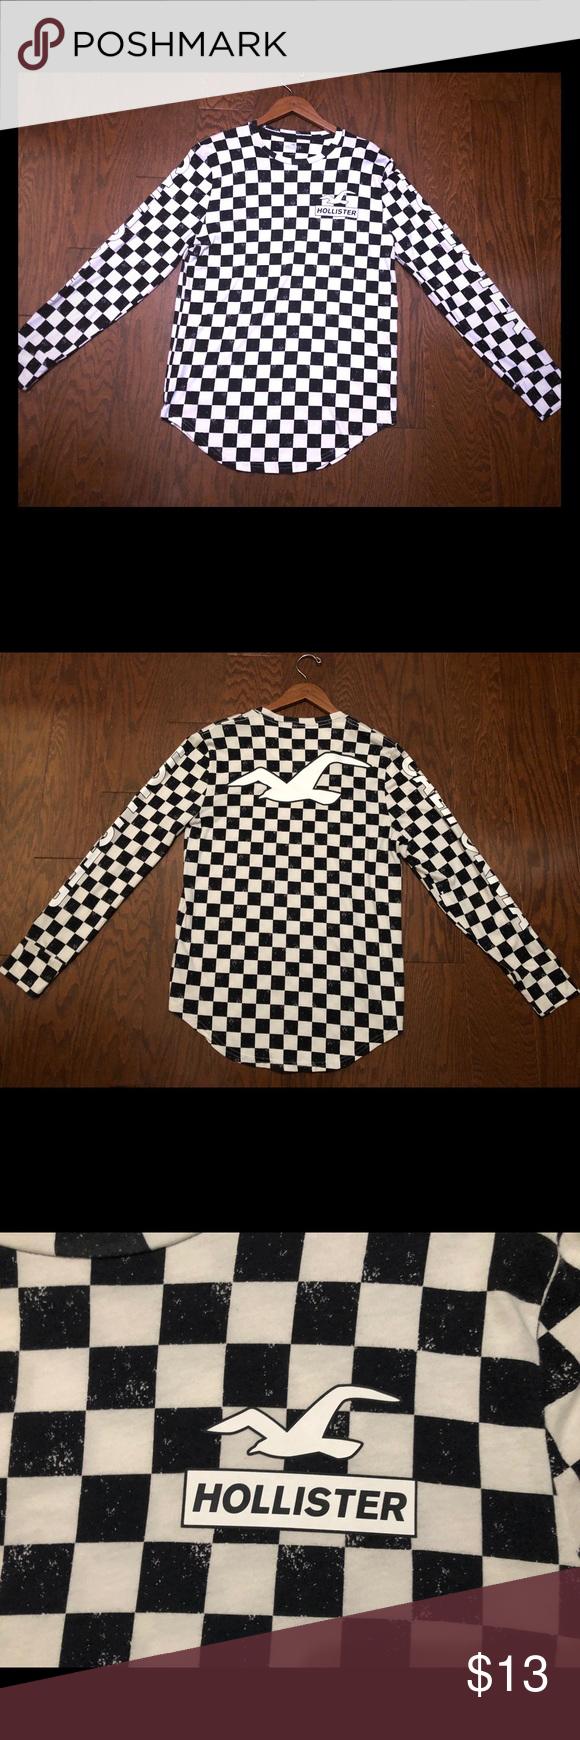 Black And White Checkered Long Sleeve Shirt